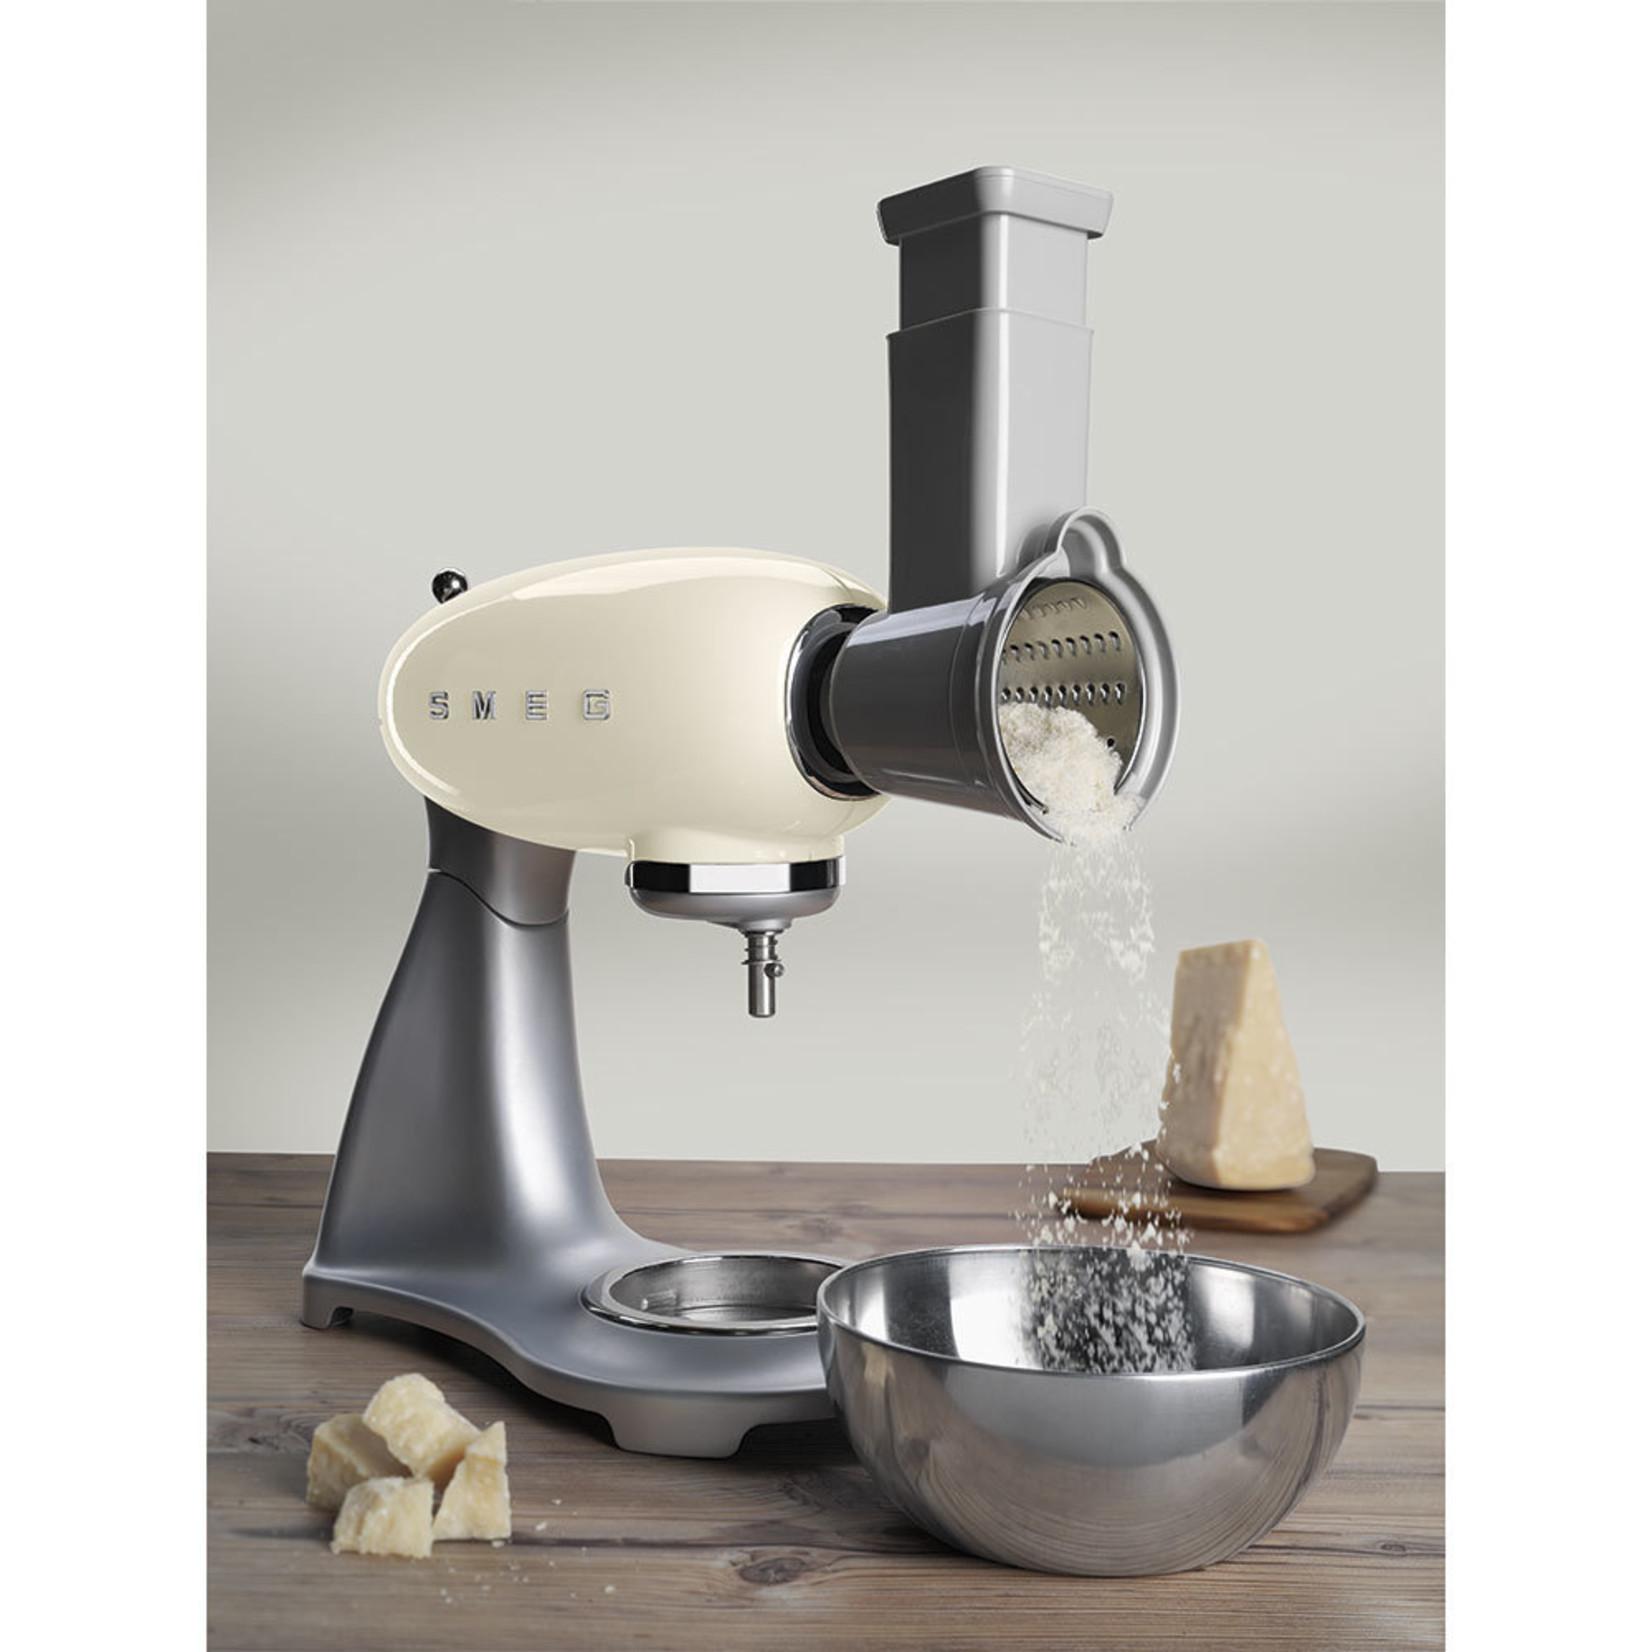 Smeg Smeg SMSG01 rasp- en snijset voor keukenmachine